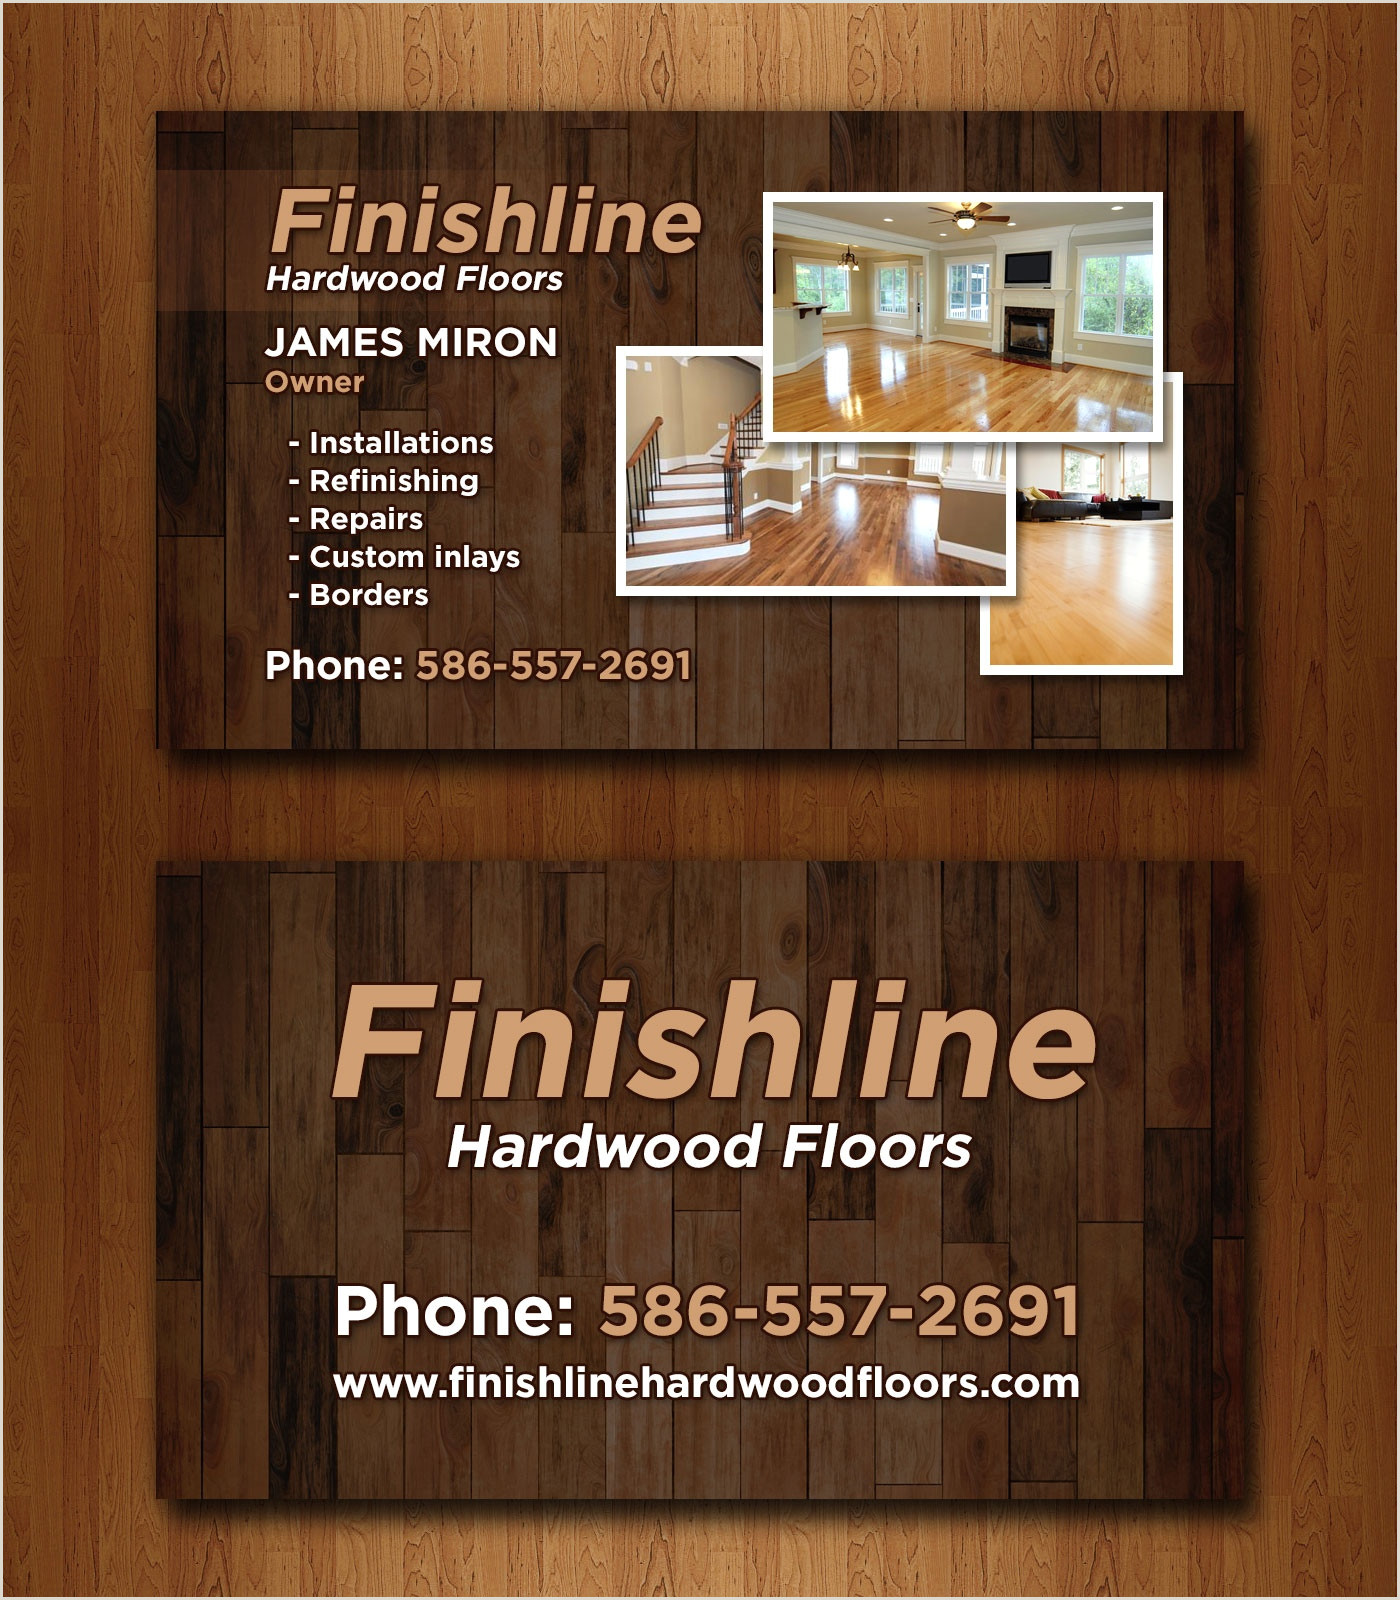 Free Modern Business Card Template 14 Popular Hardwood Flooring Business Card Template